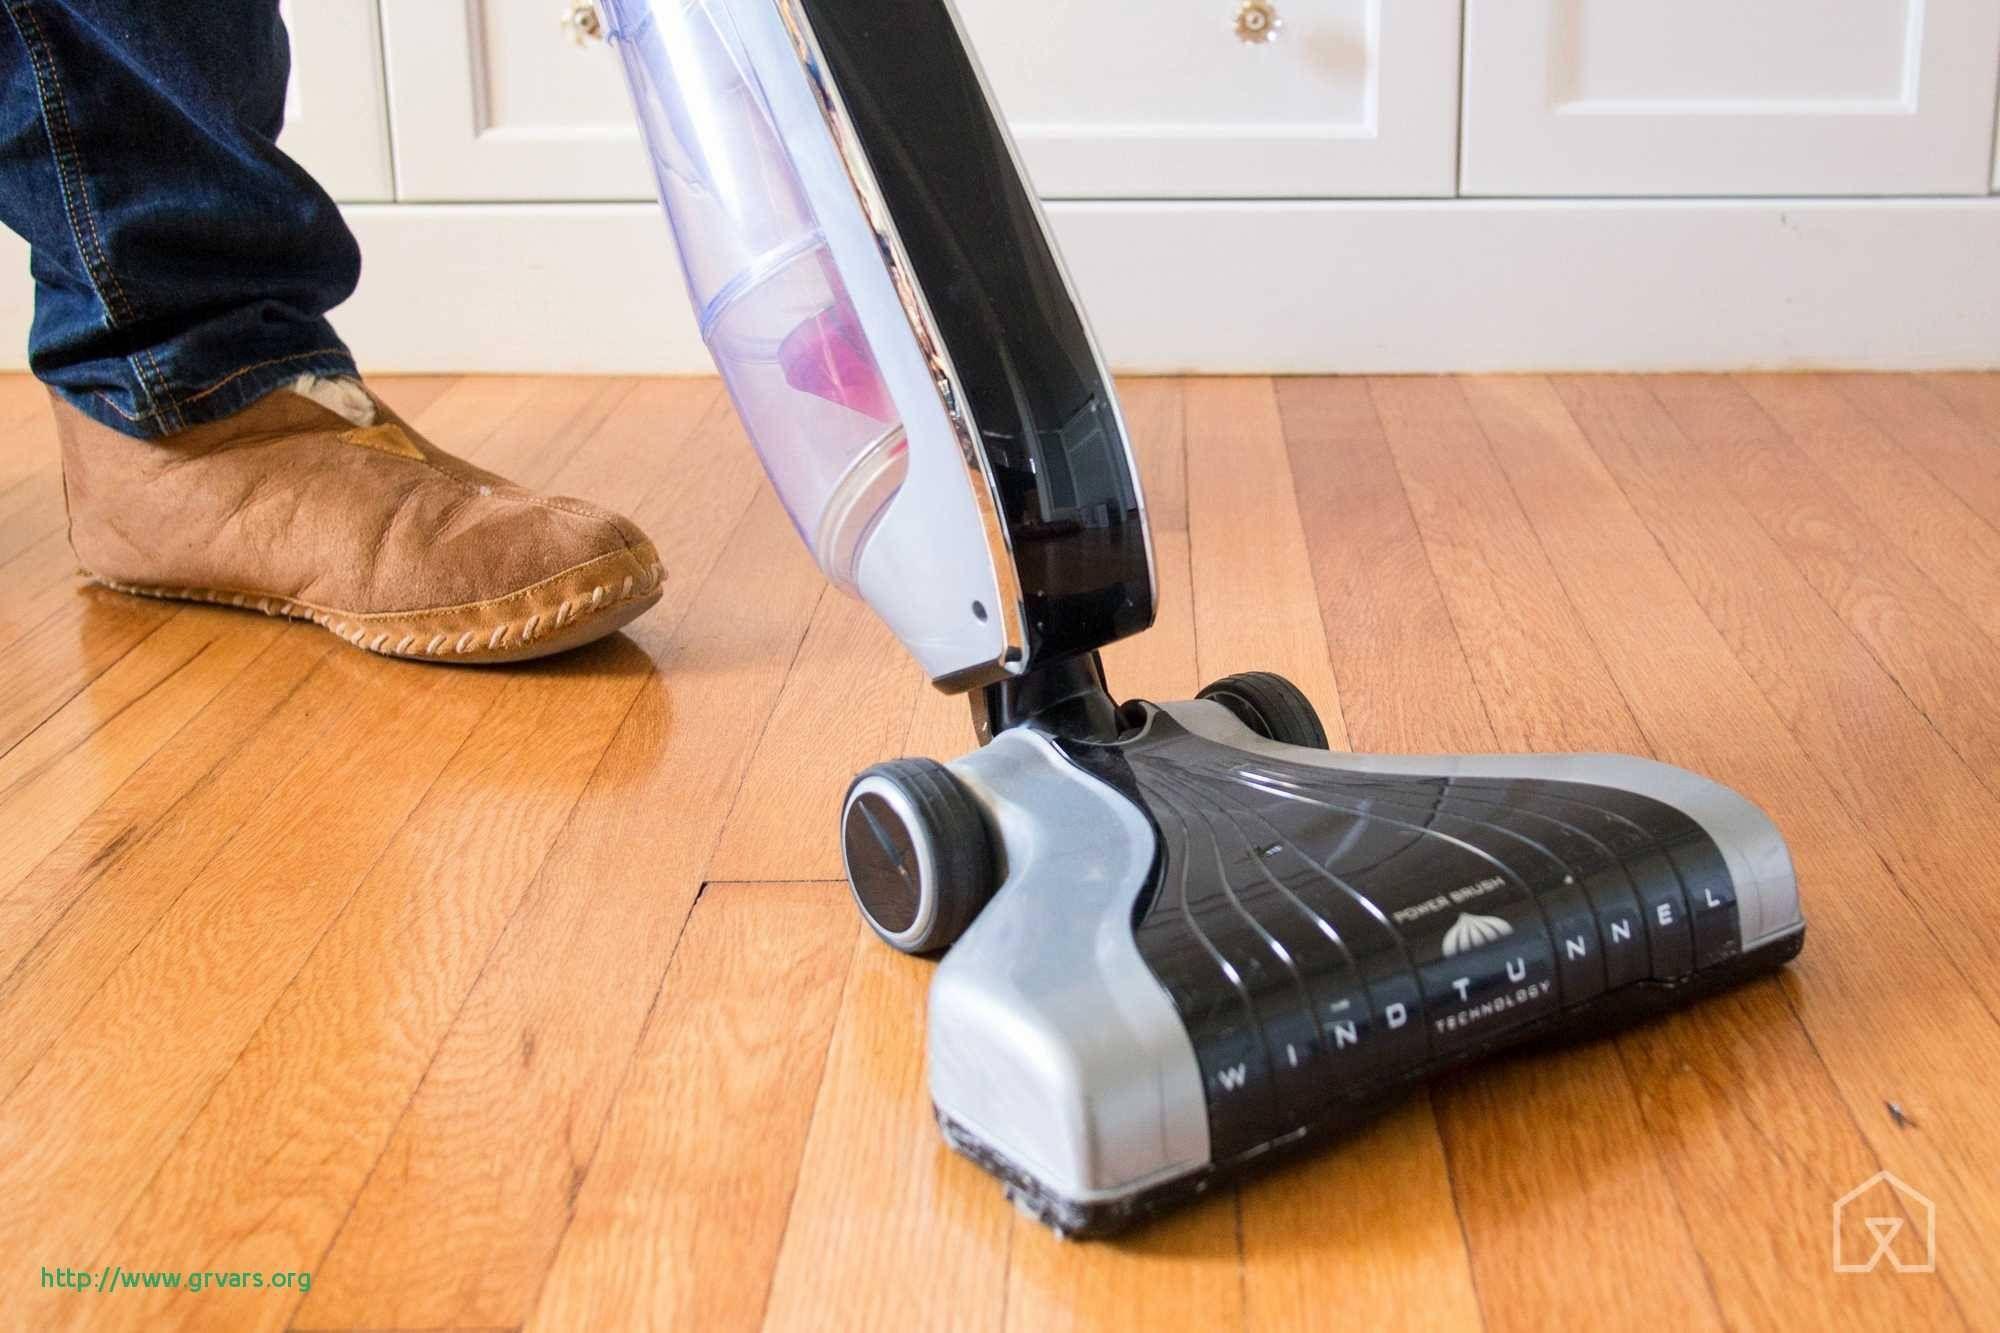 Floor And Steam Cleaners Buildingdesign Homedesign Architecture Home Design Housedes Best Cordless Vacuum Vacuum For Hardwood Floors Laminate Flooring